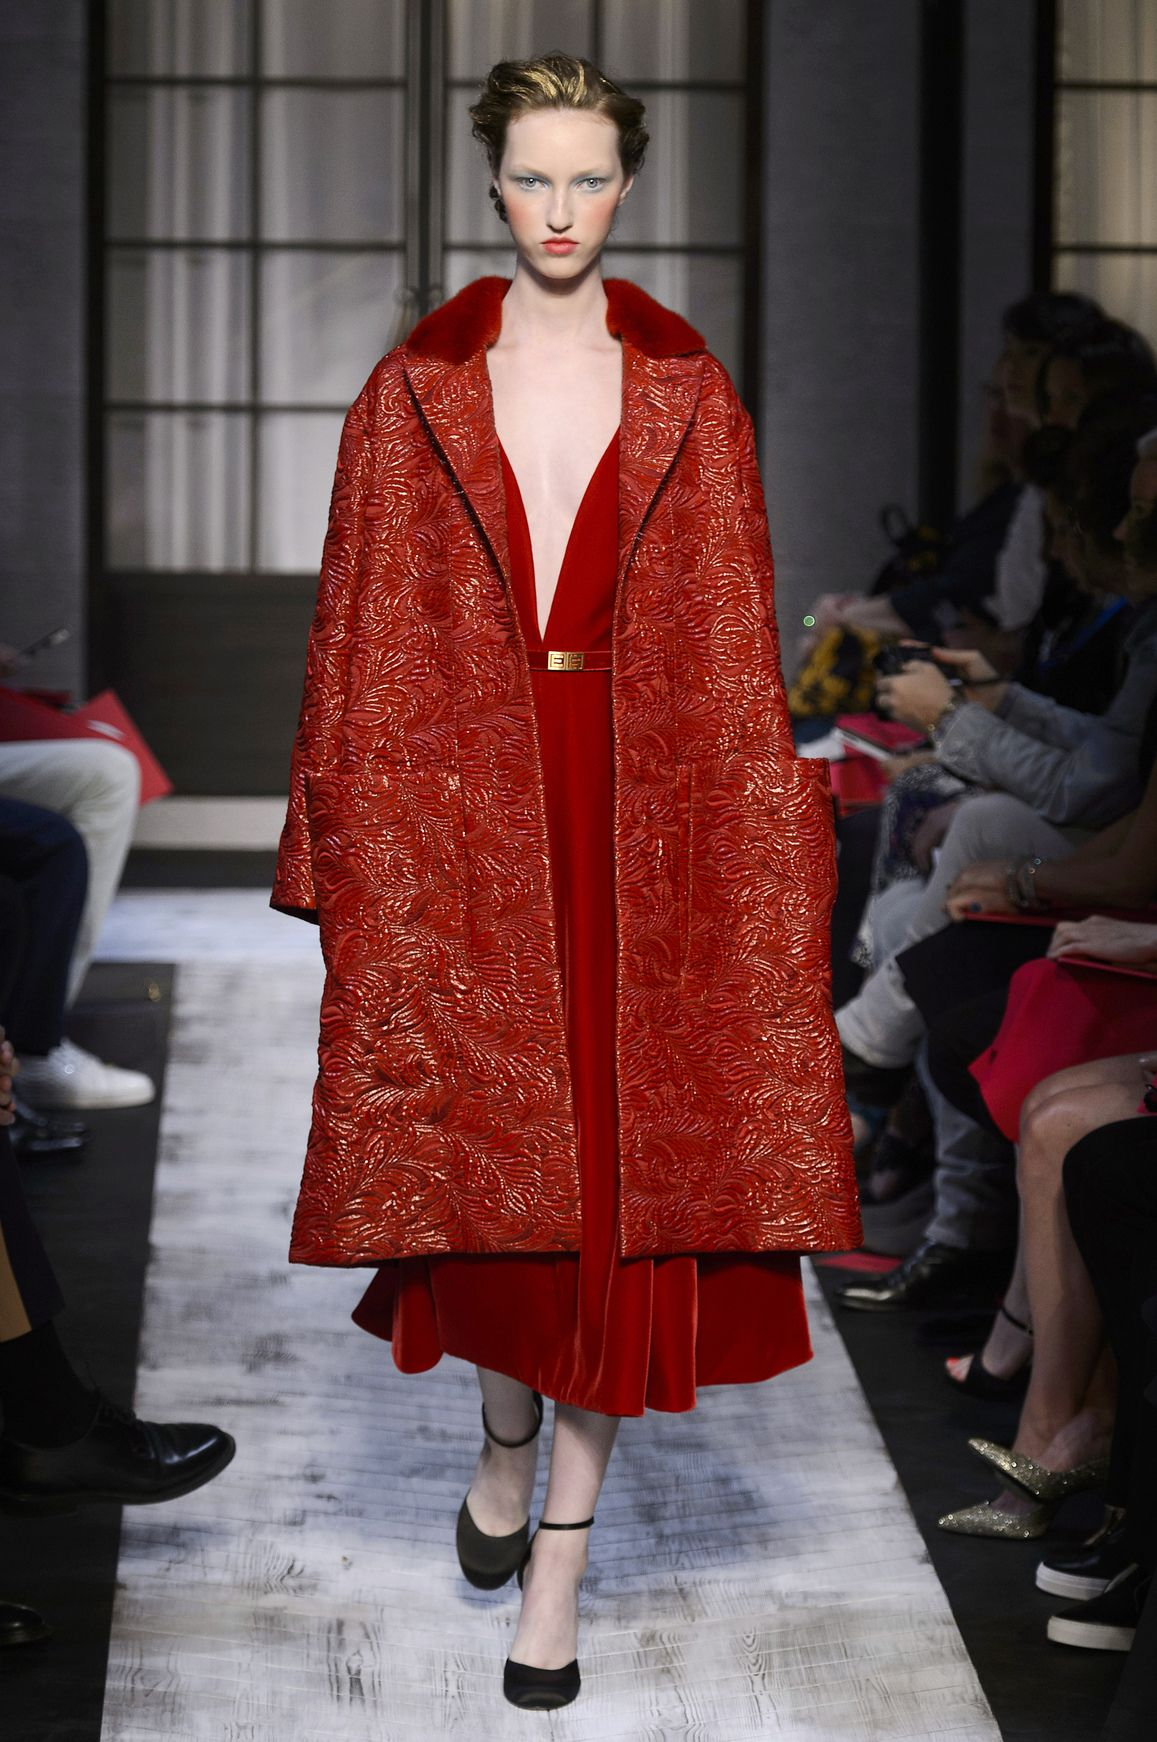 Schiaparelli Couture Fall 15', Buro 24/7 Australia